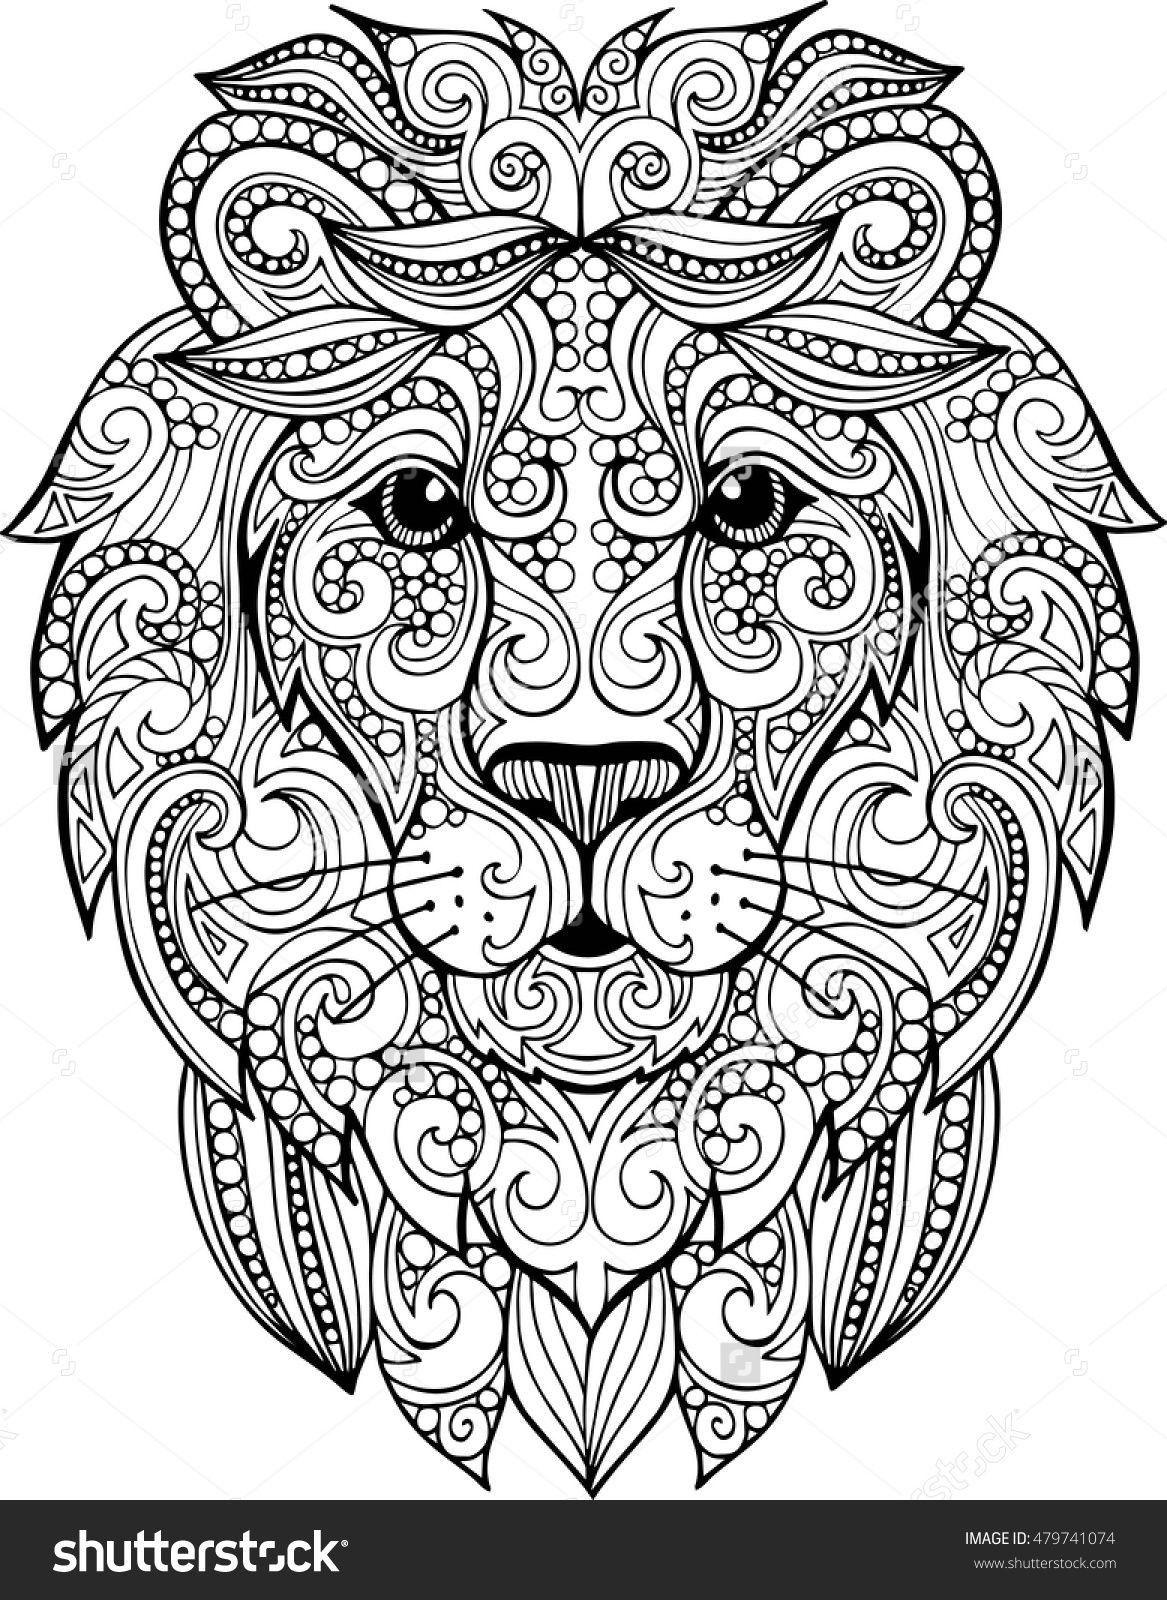 Colouring Page Lion Coloring Pages Mandala Coloring Pages Lion